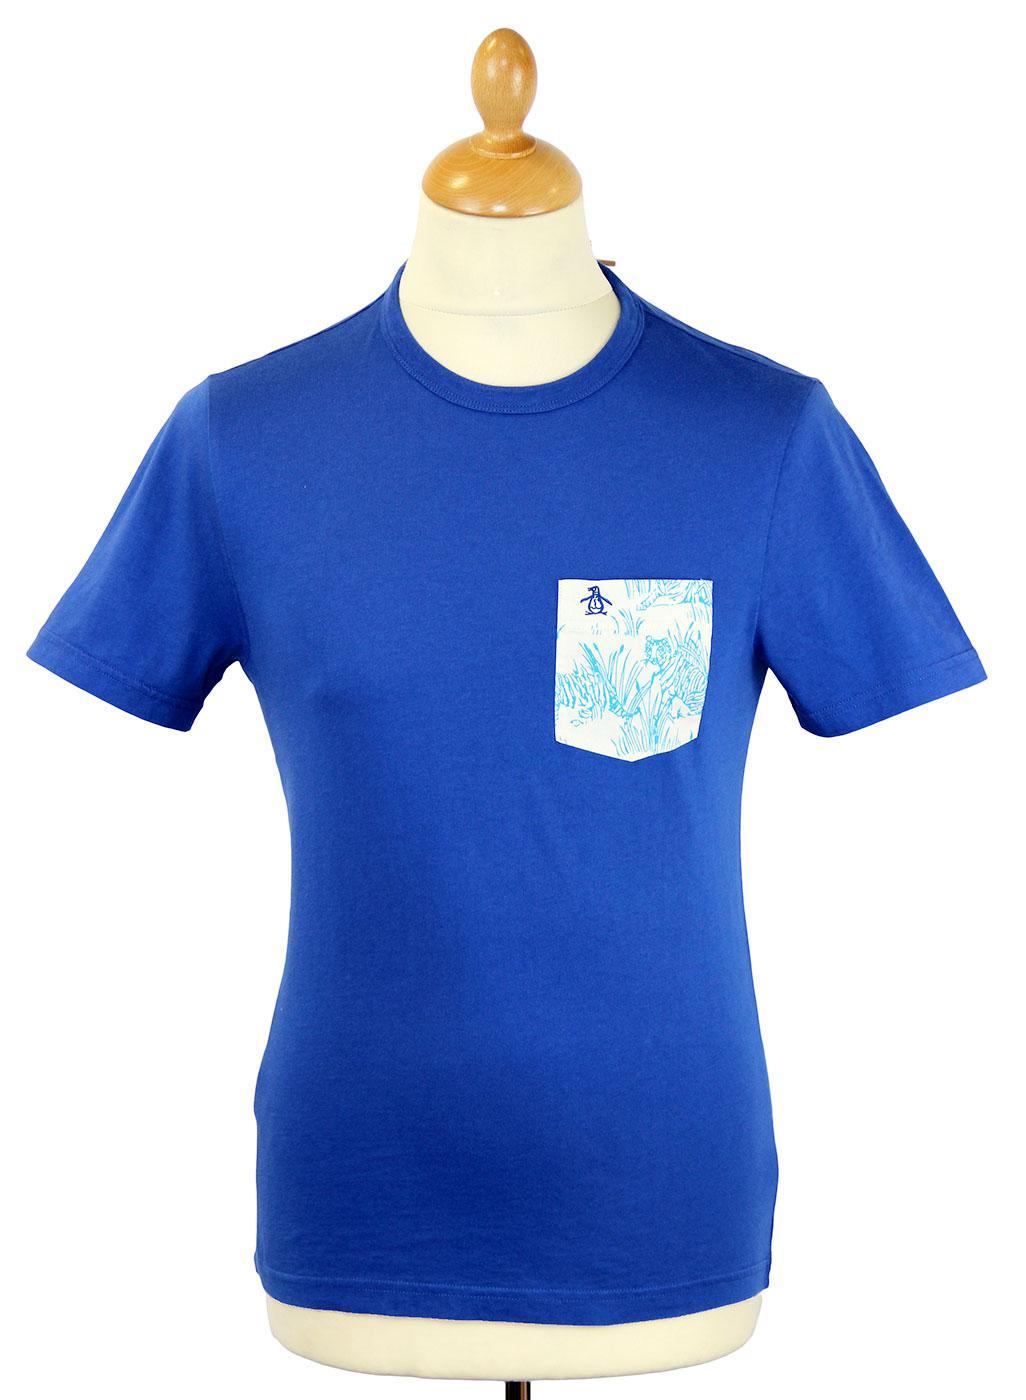 Tiger Pocket ORIGINAL PENGUIN Retro Indie T-shirt